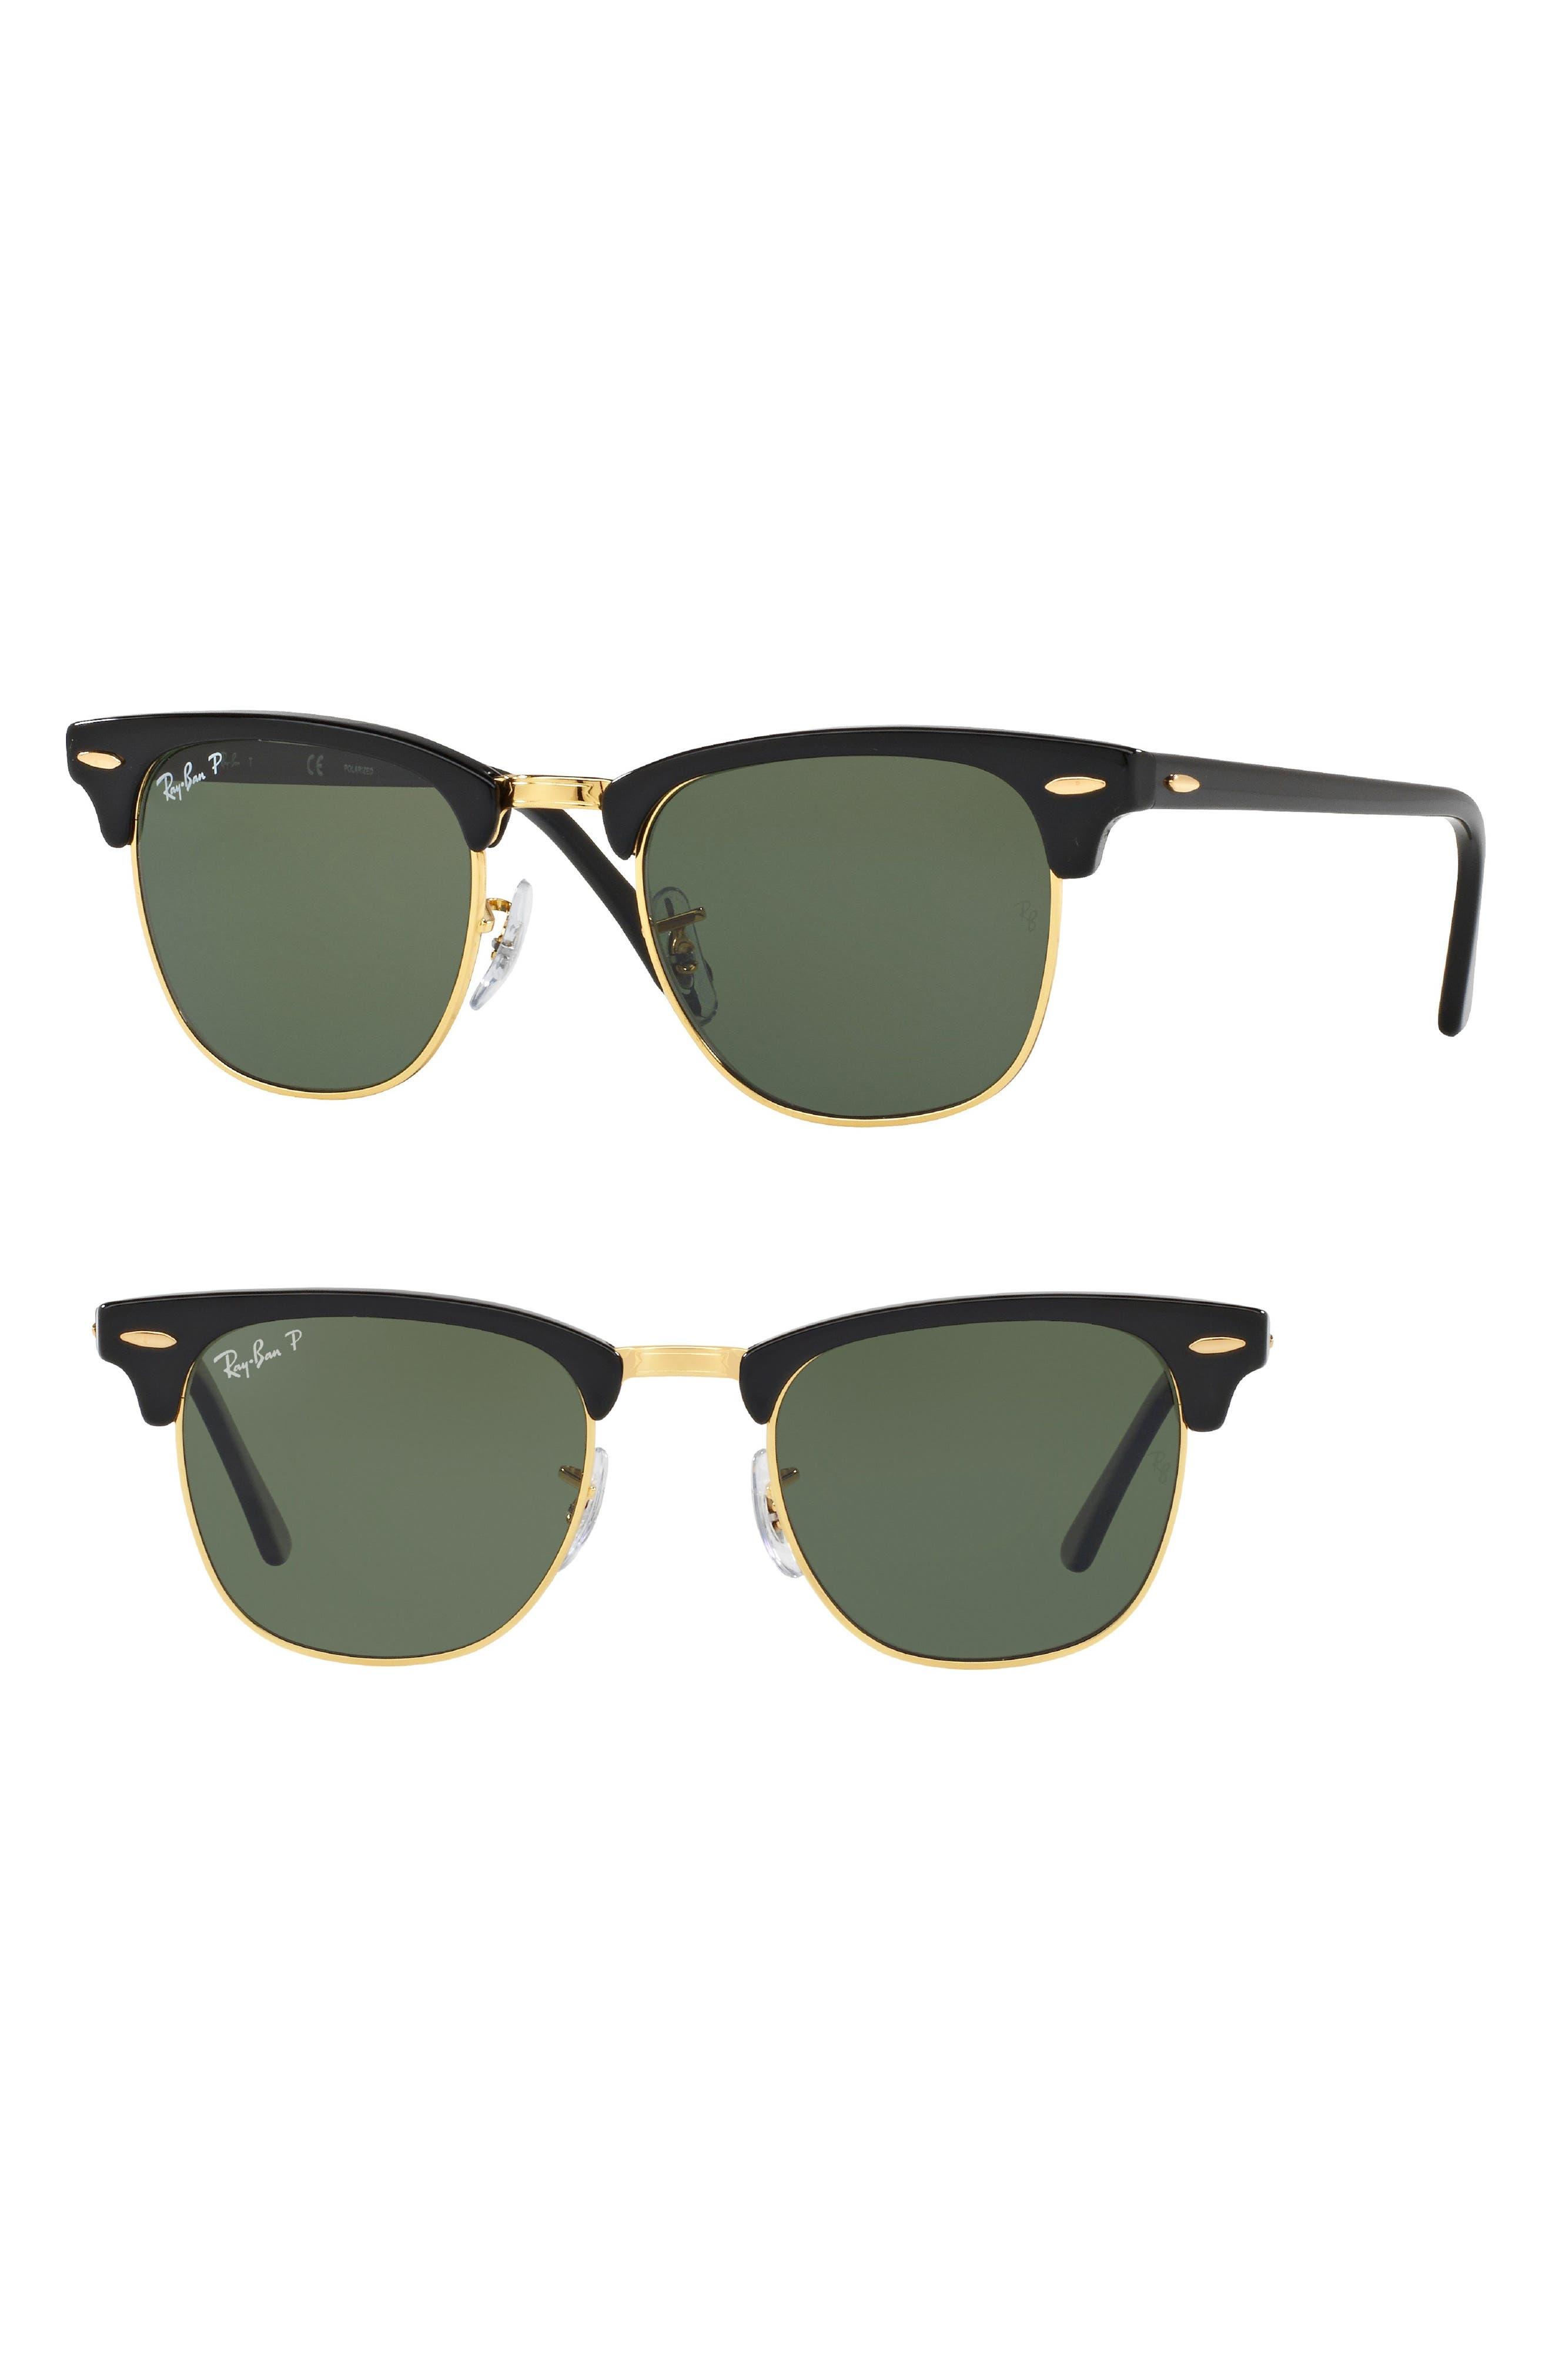 Clubmaster 51mm Polarized Sunglasses,                             Main thumbnail 1, color,                             BLACK